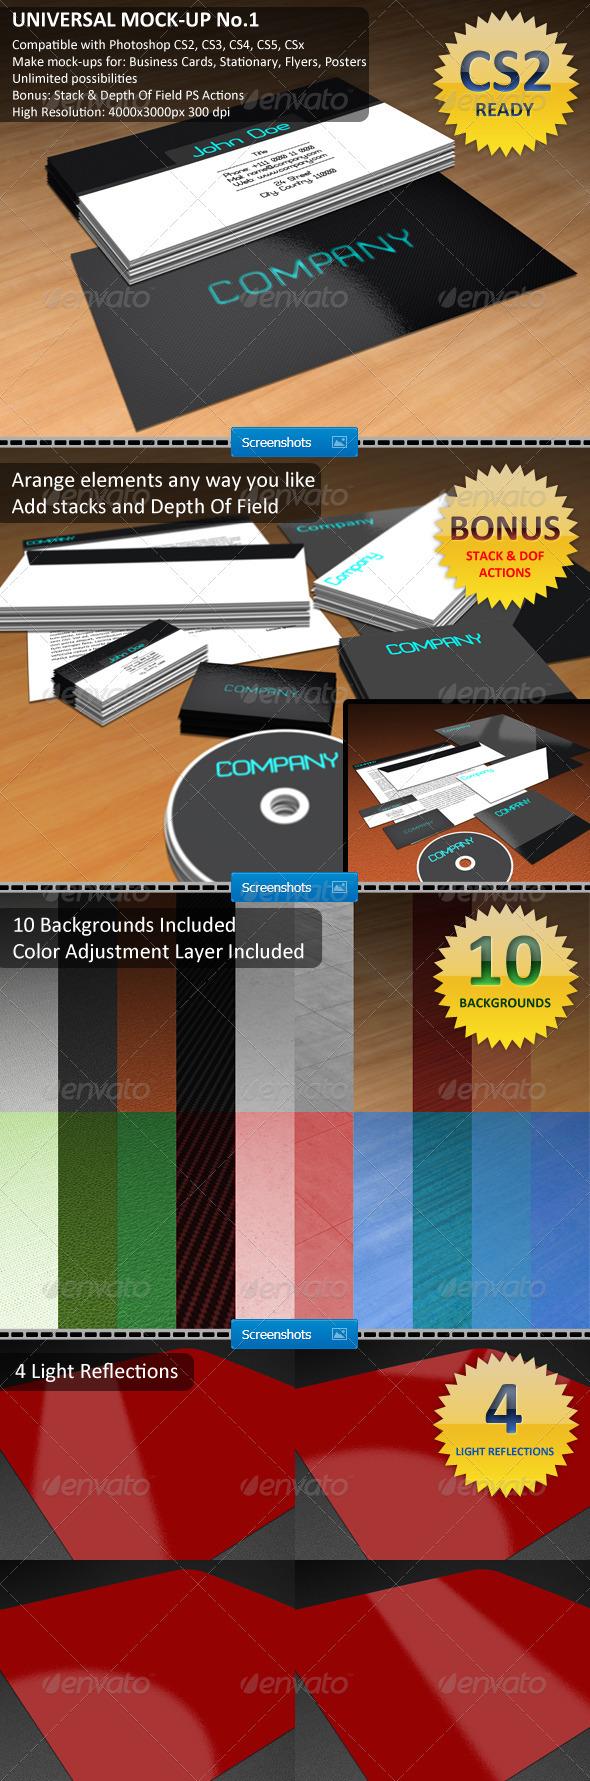 GraphicRiver Universal Mock-Up No.1 1580672